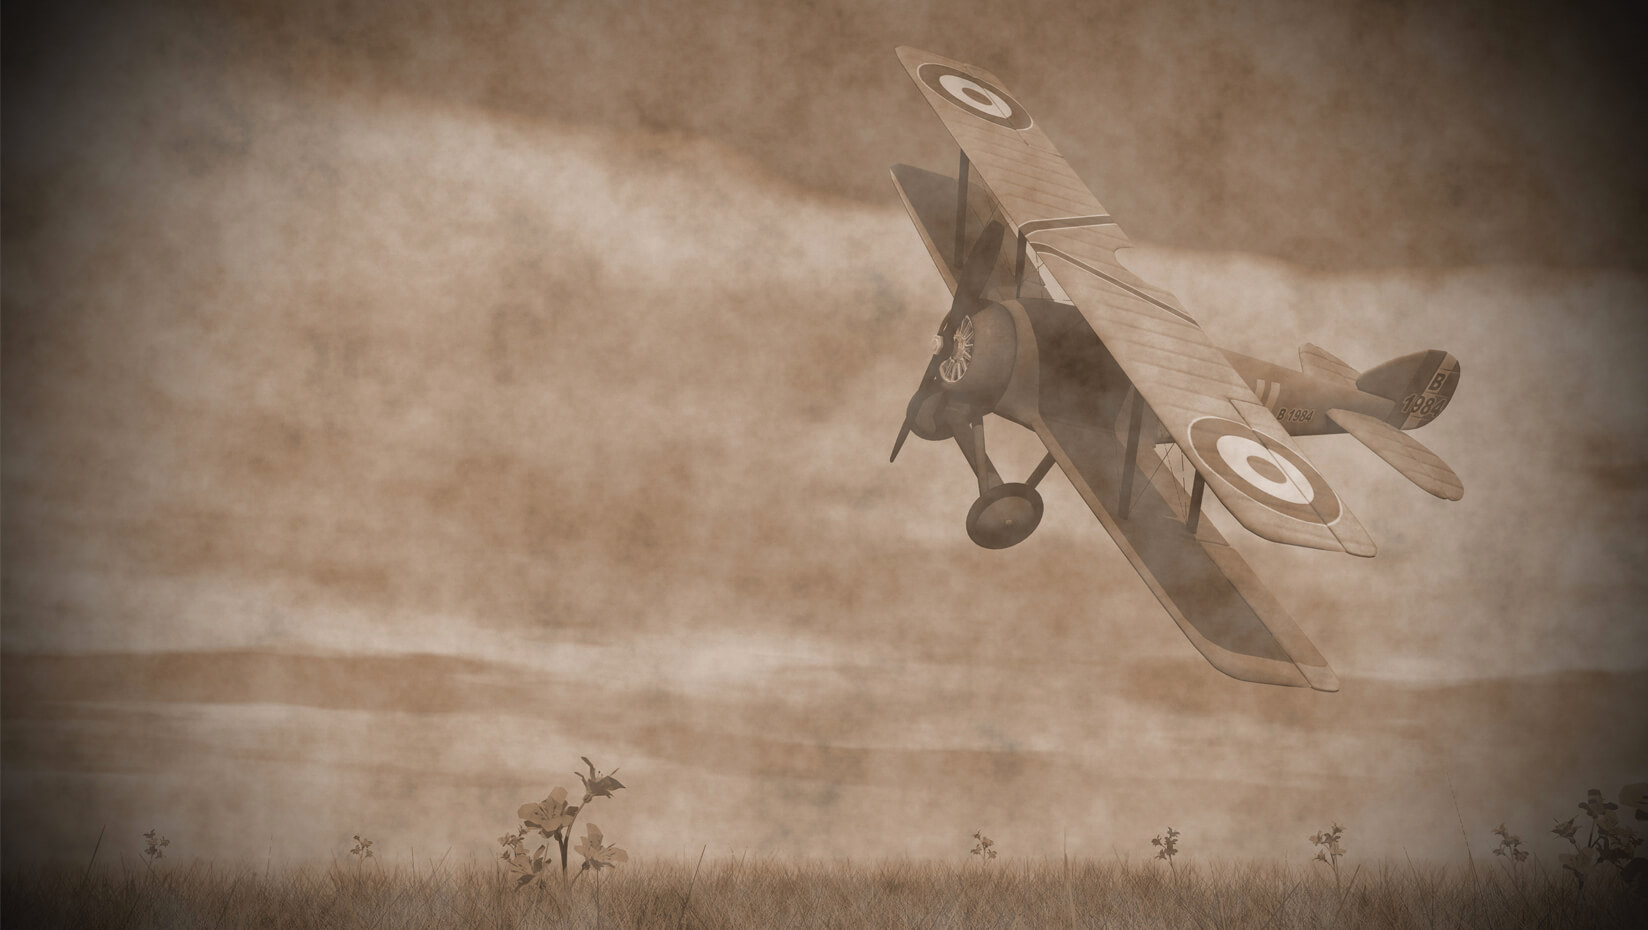 WWI plane flying of a field